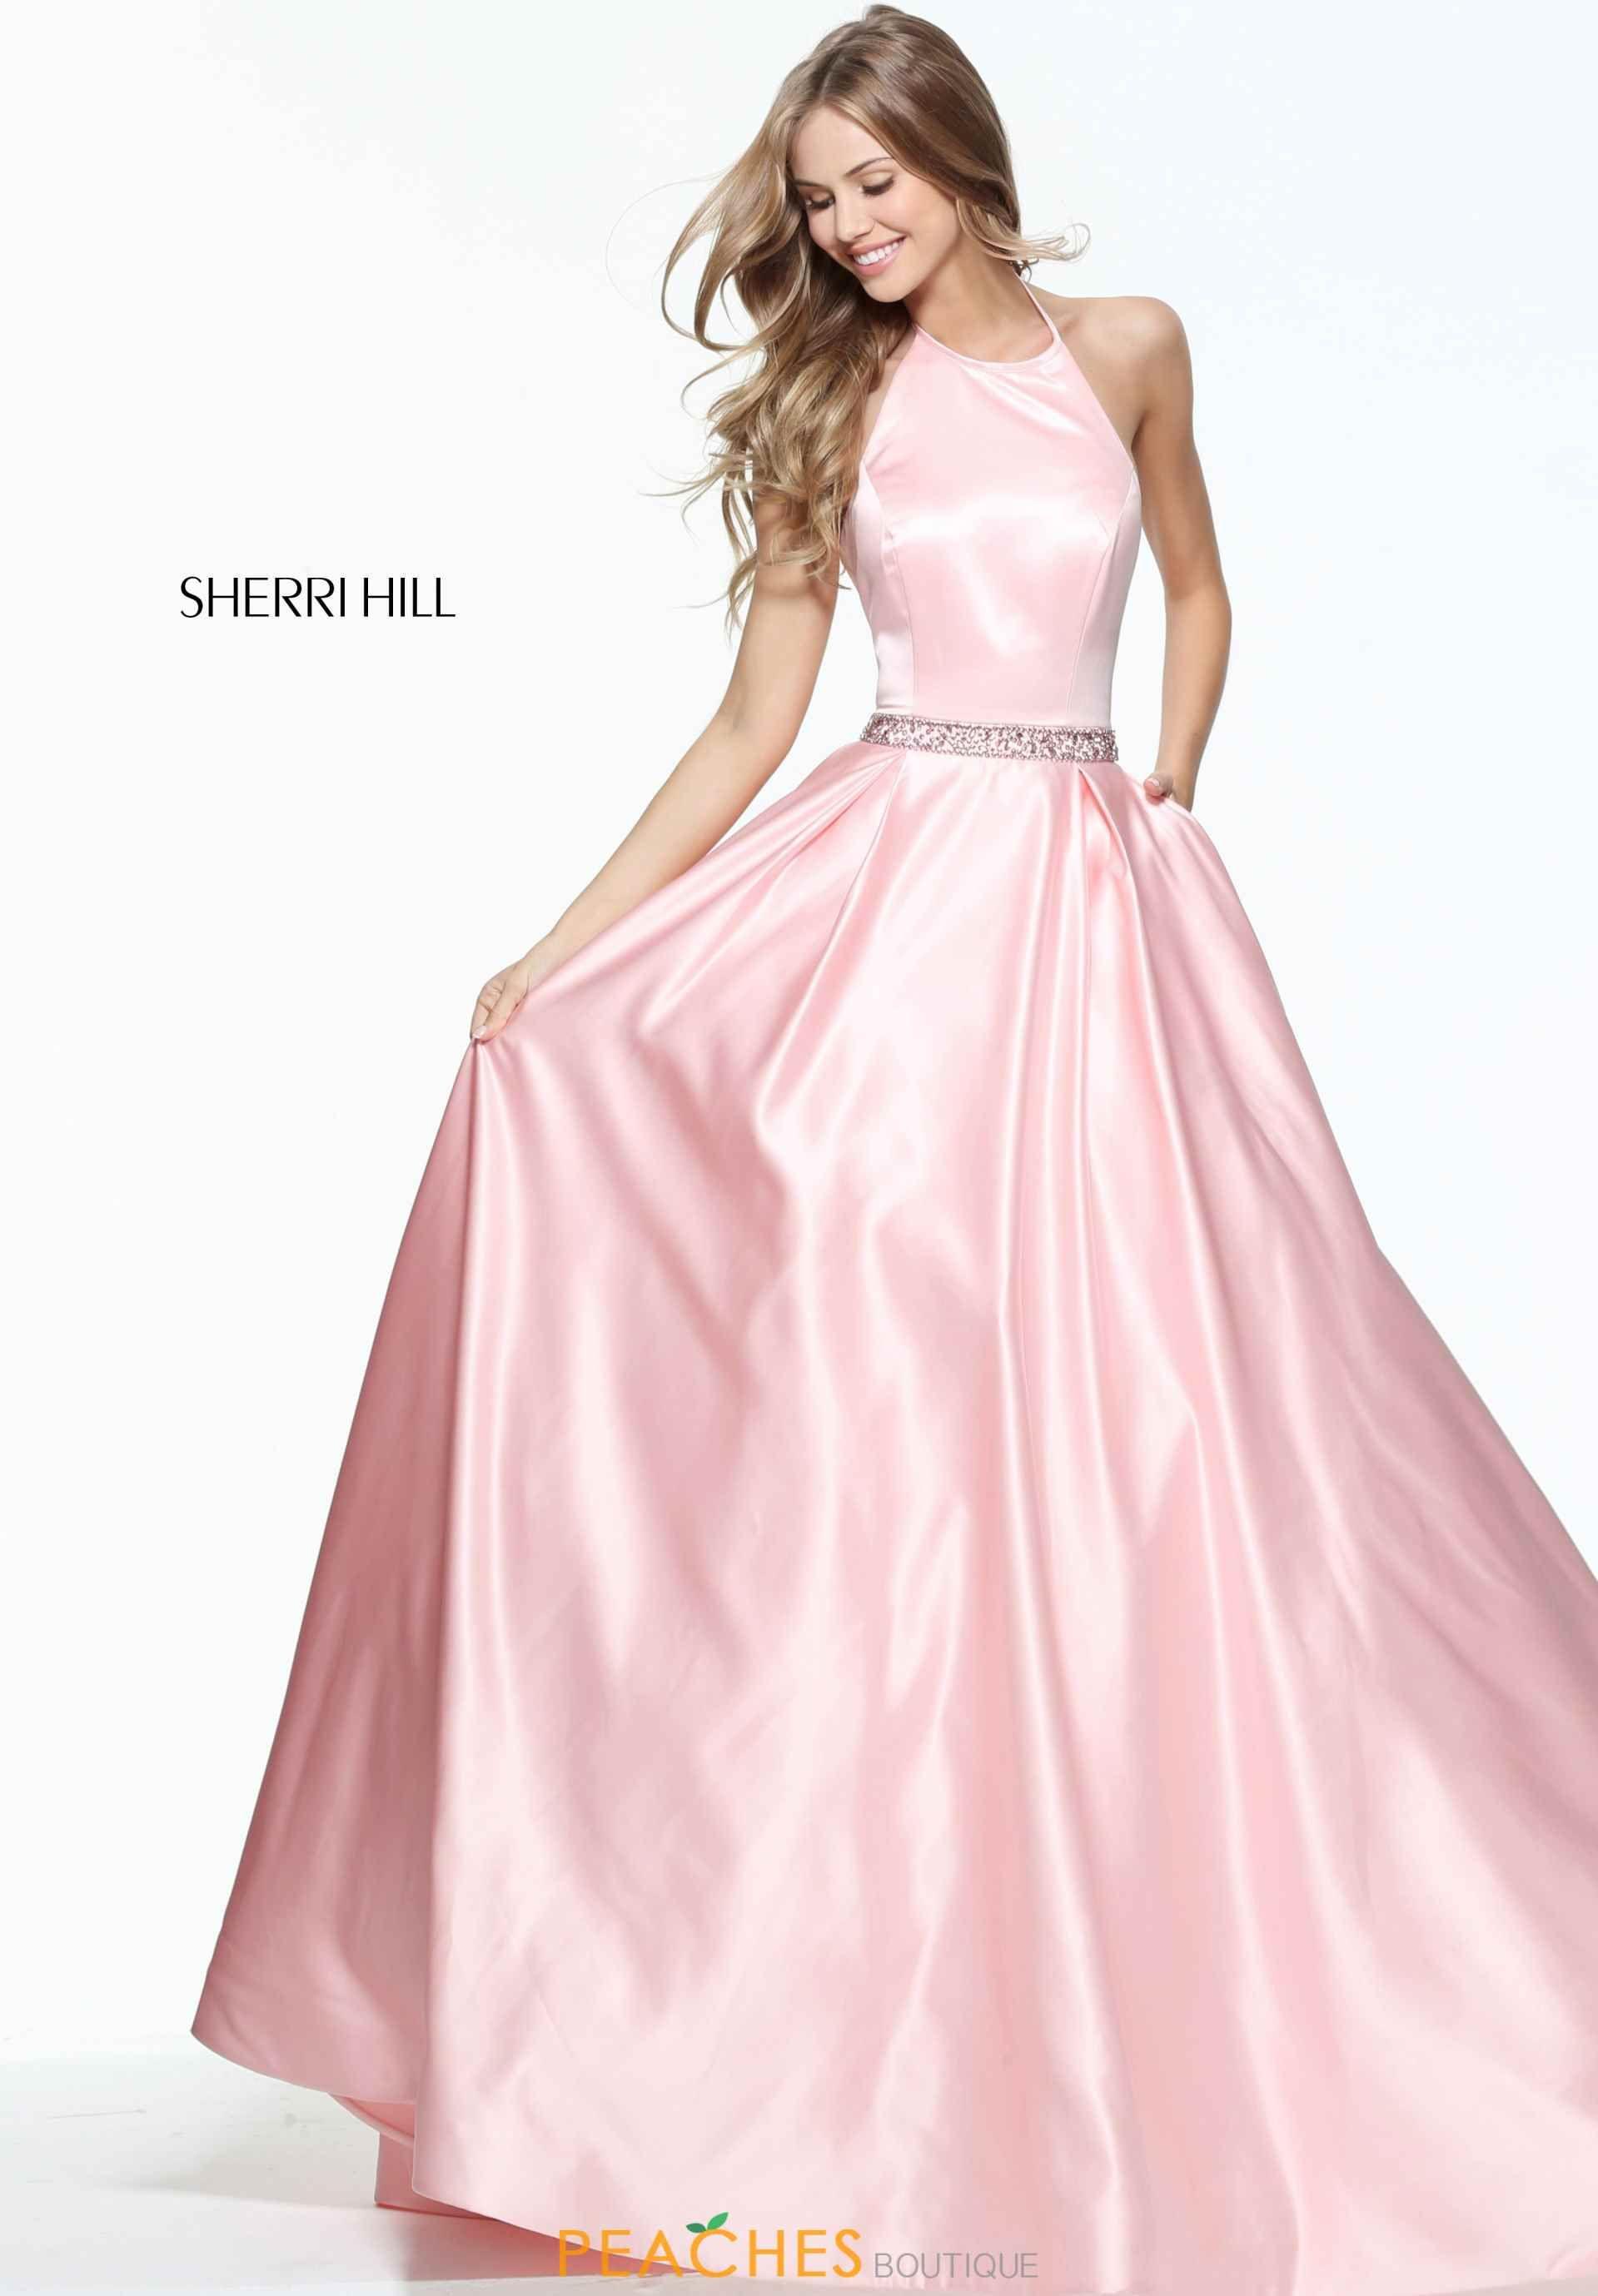 Sherri Hill High Neckline A Line Dress 51036   Prom 2017   Pinterest ...